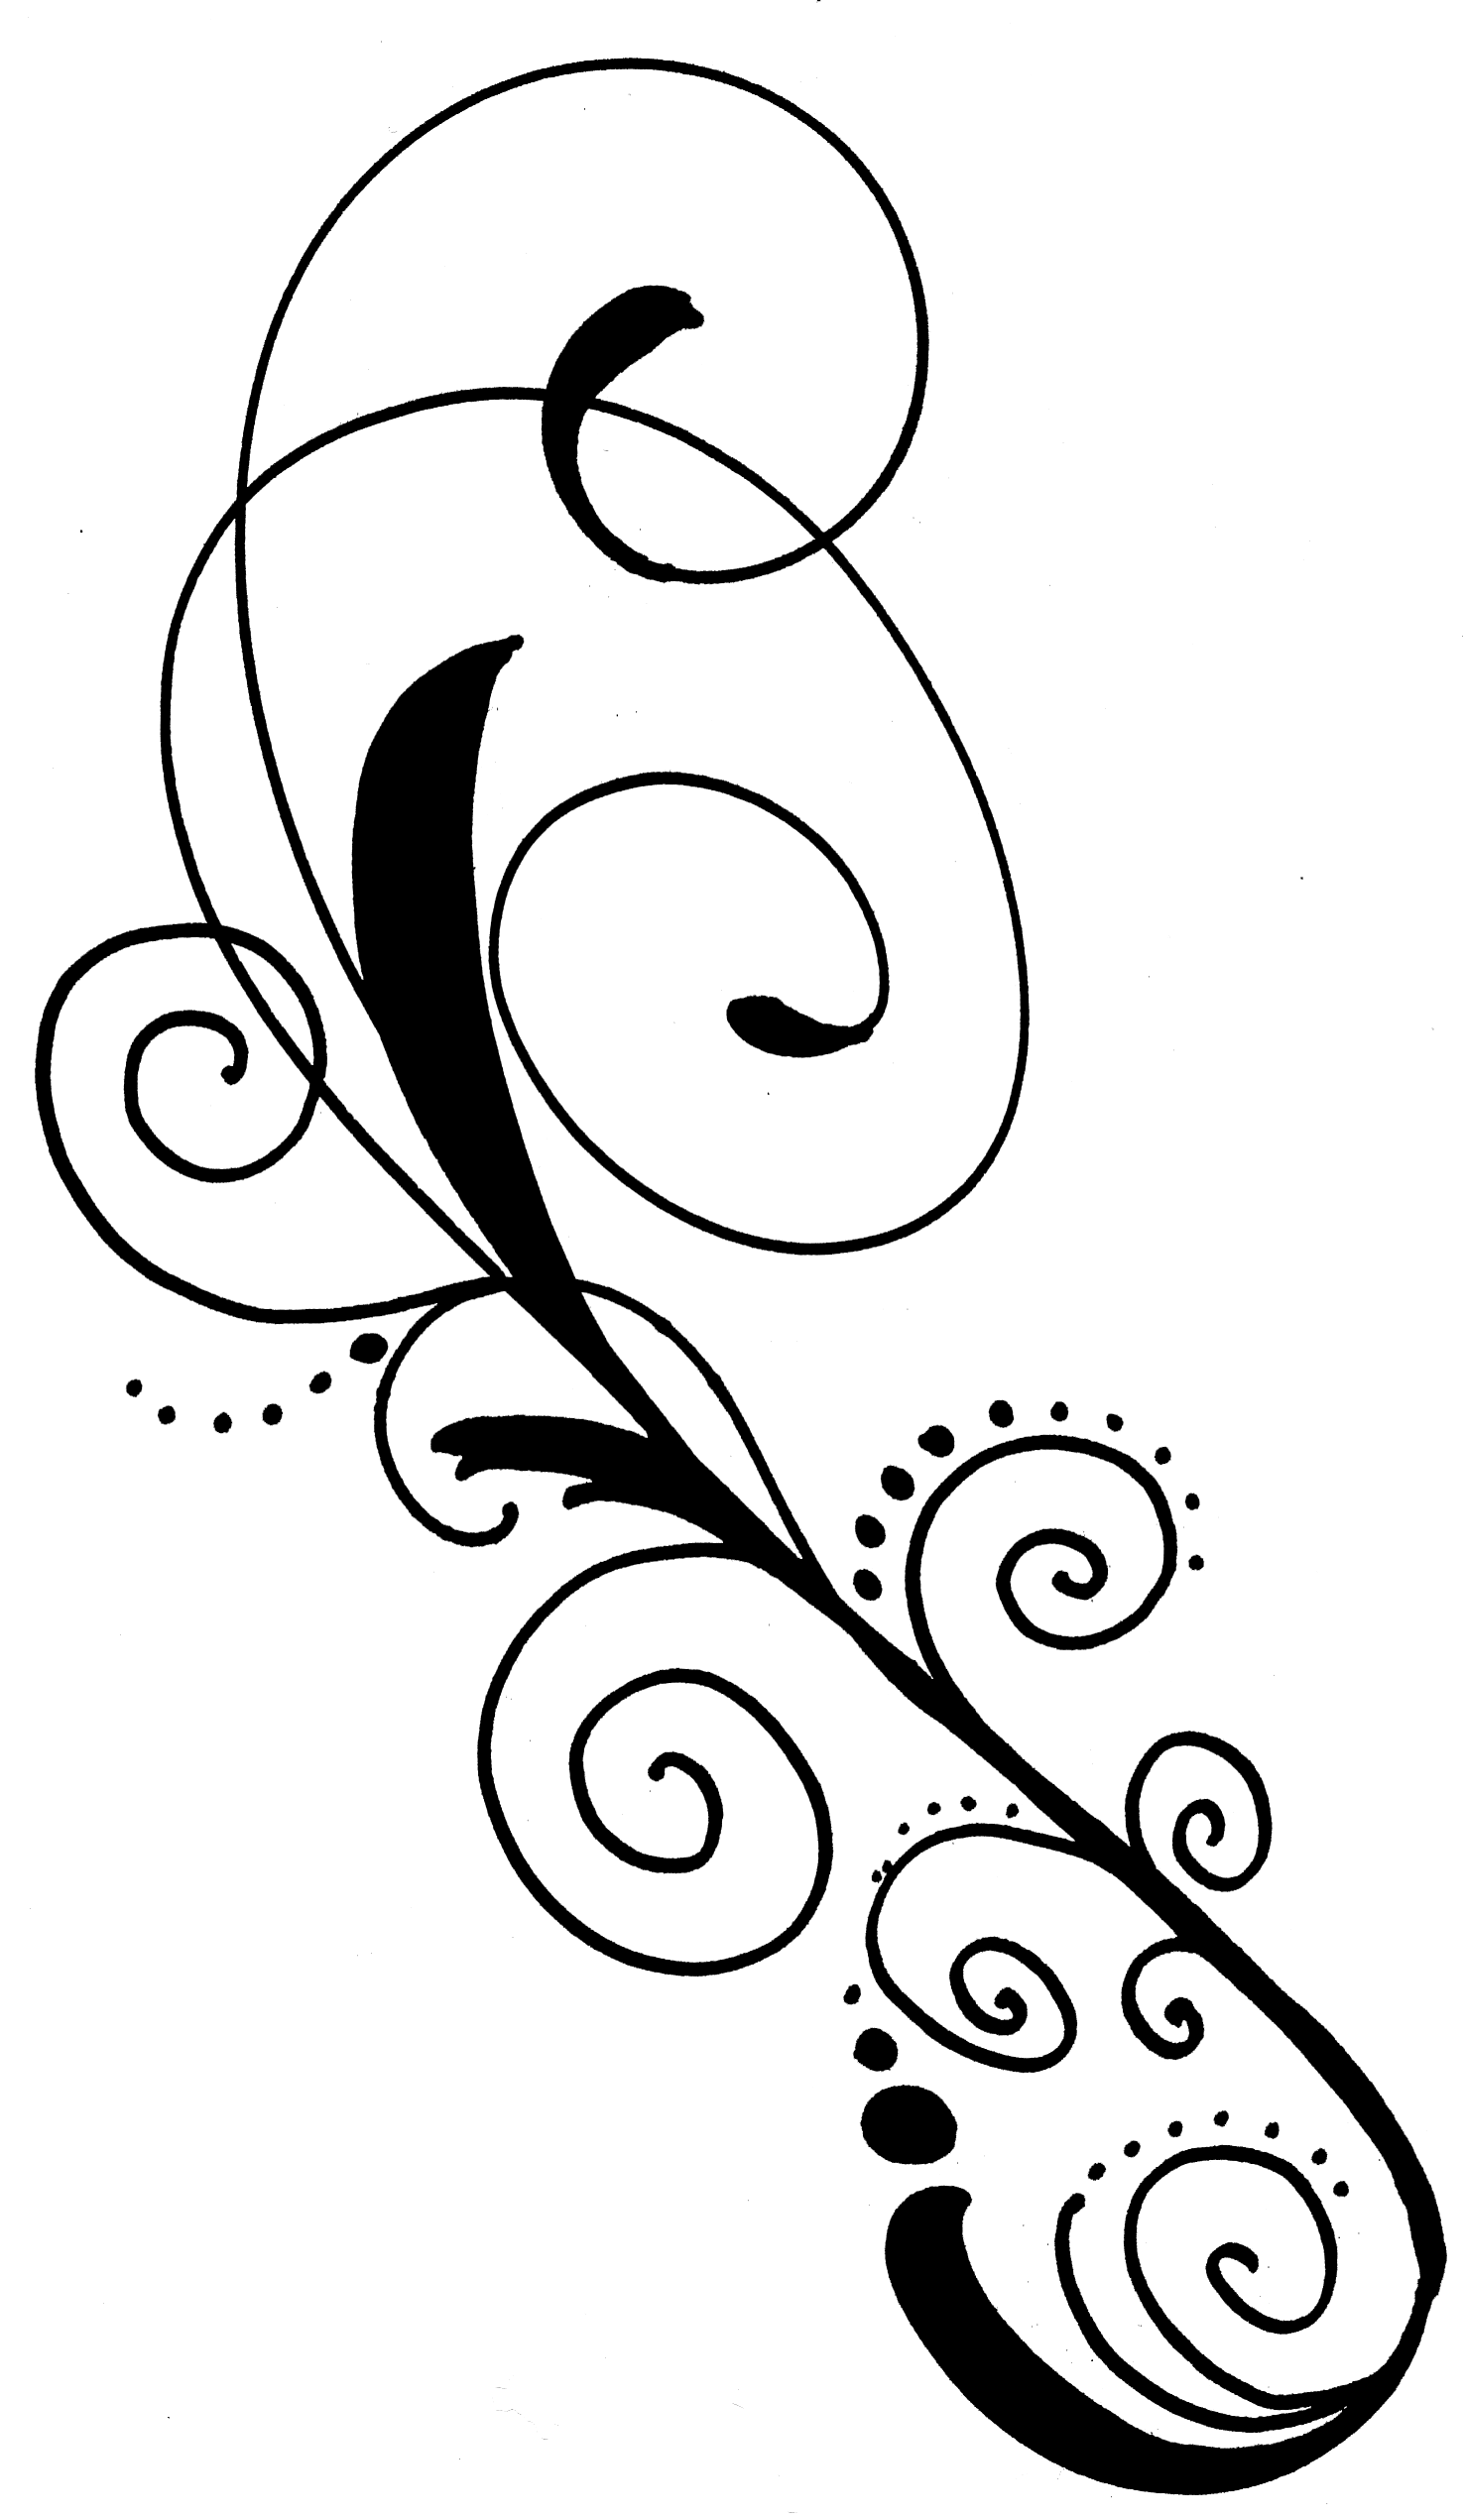 Drawn swirl clip art. Syringe clipart vector